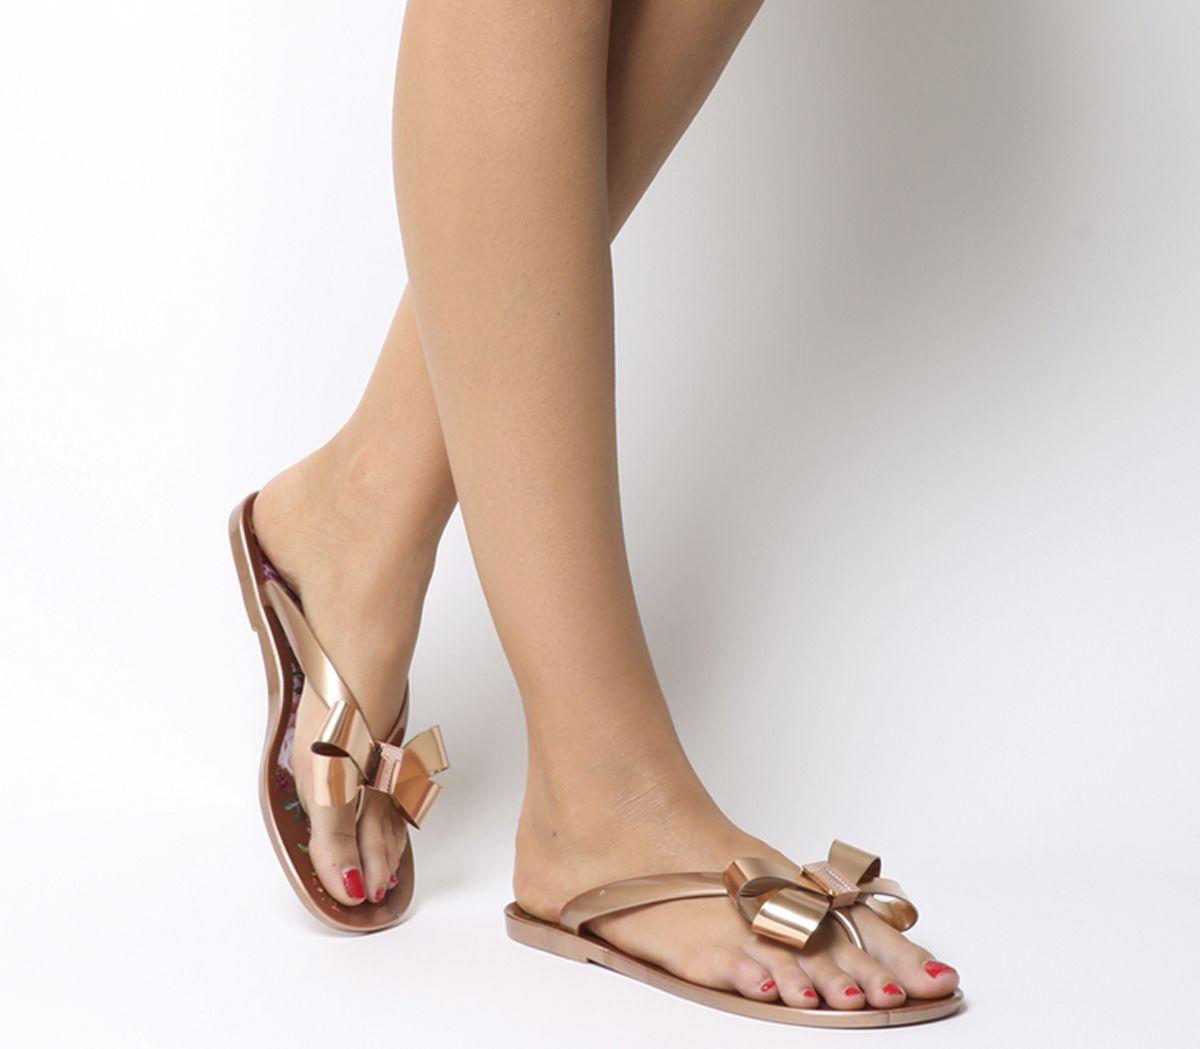 7a5062f2b Ted Baker Susziep Flip Flops Rose Gold Serenity - Sandals